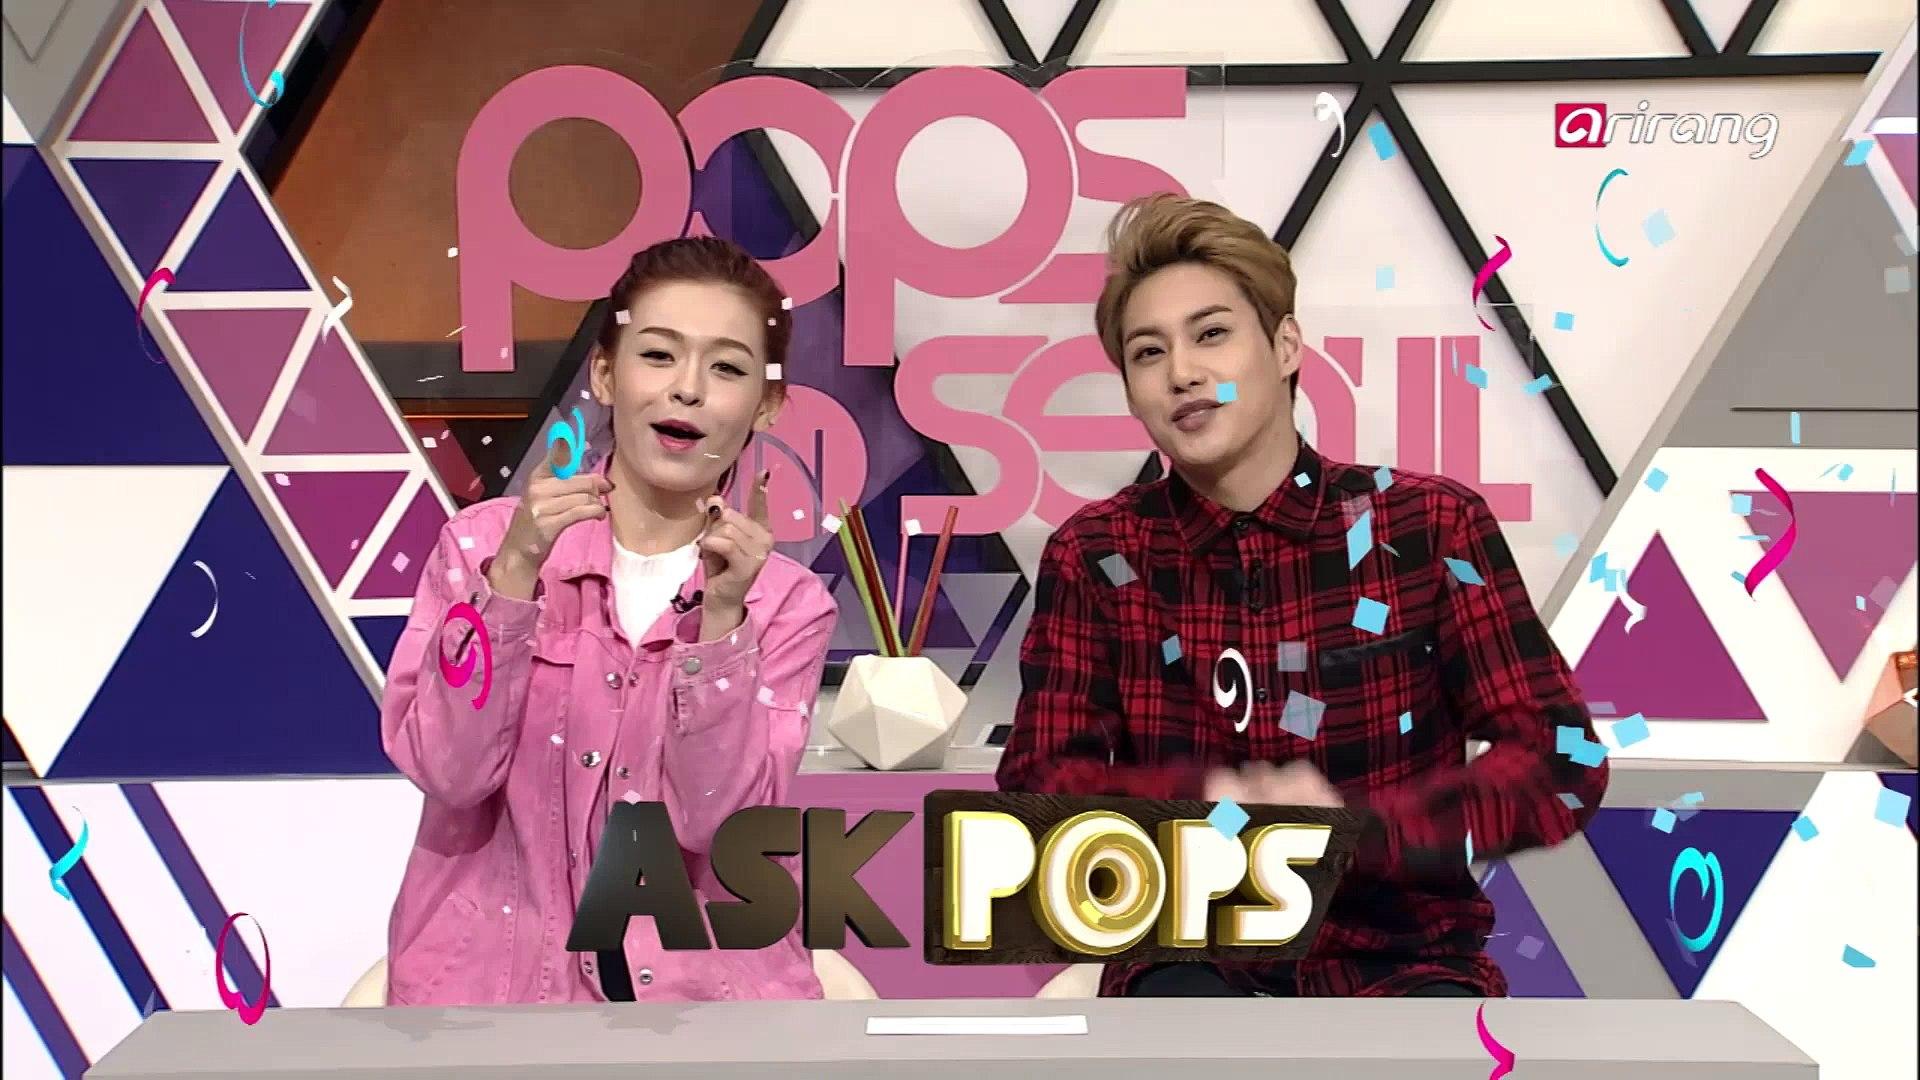 (05.13.16) K-Pop Single Chart, K Pop-Album Chart